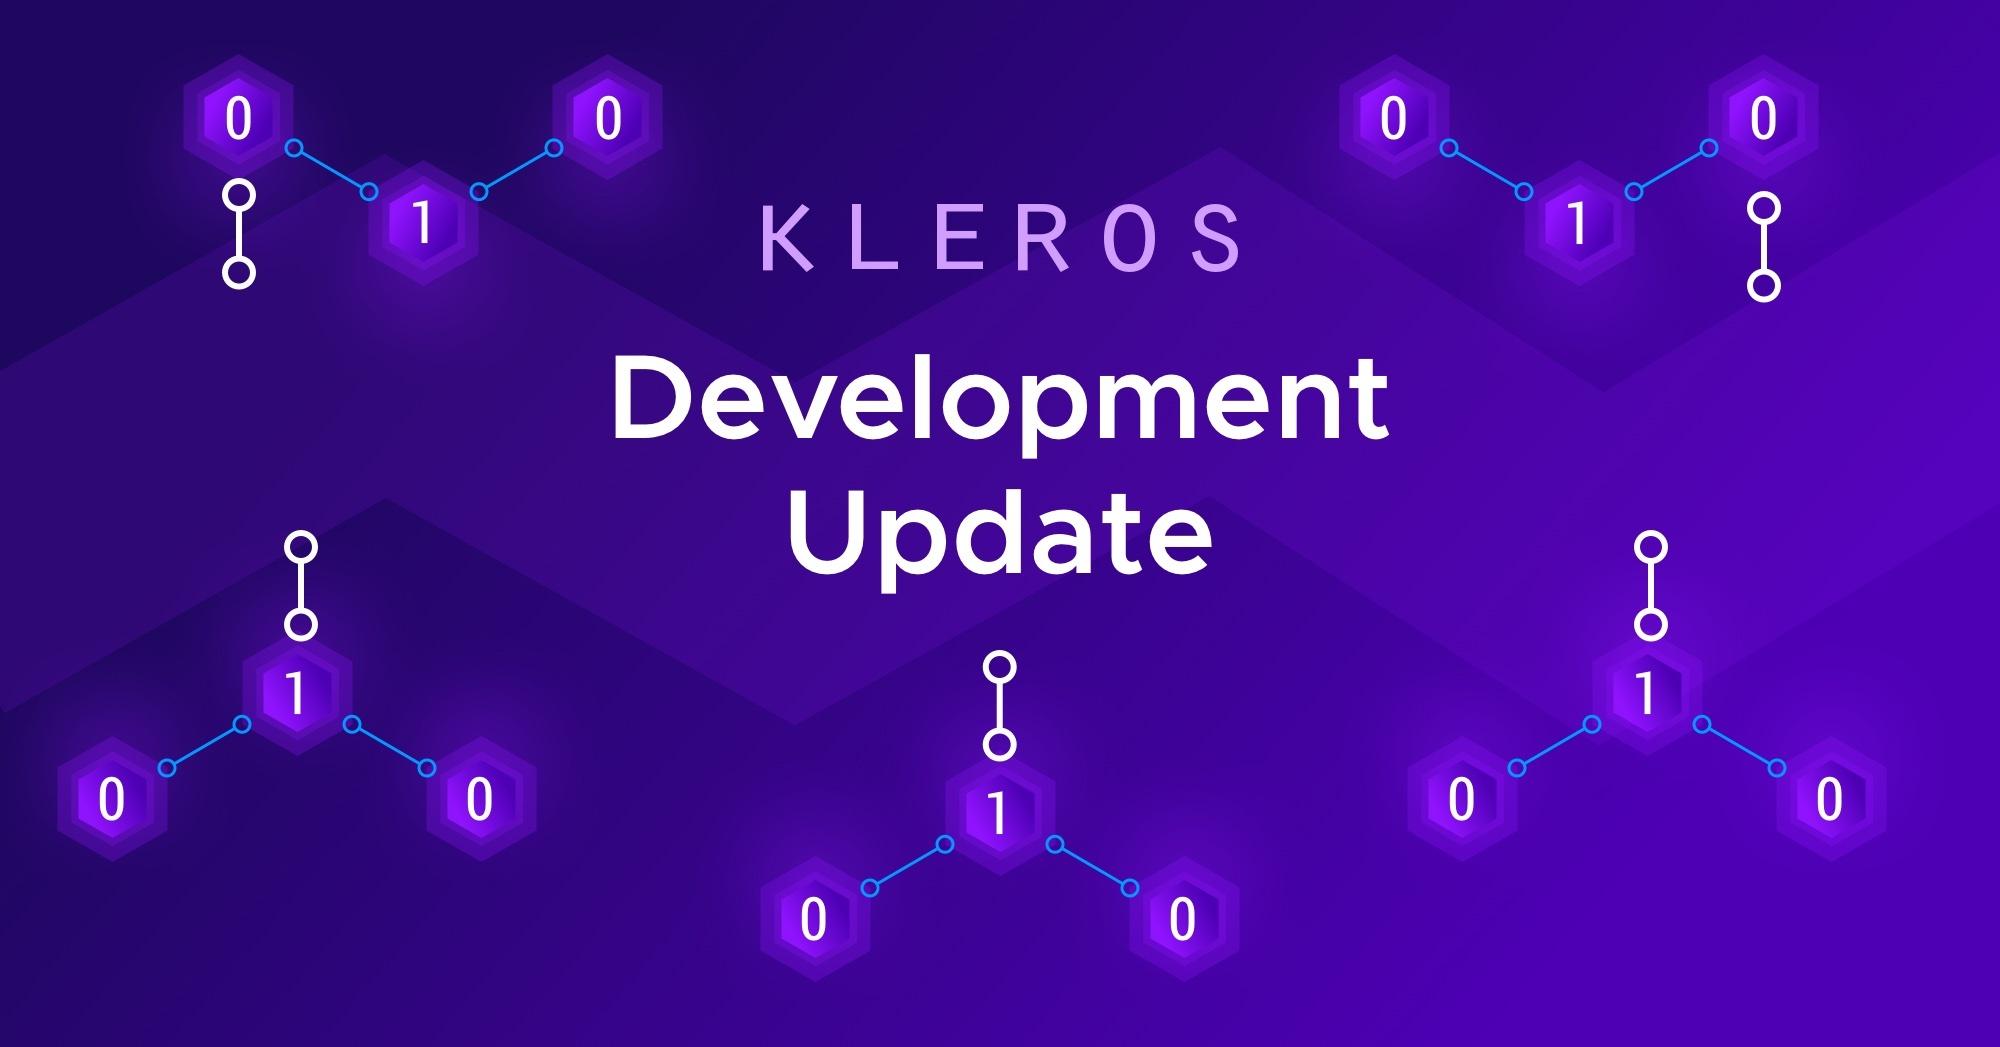 Kleros Development Update: April 2020